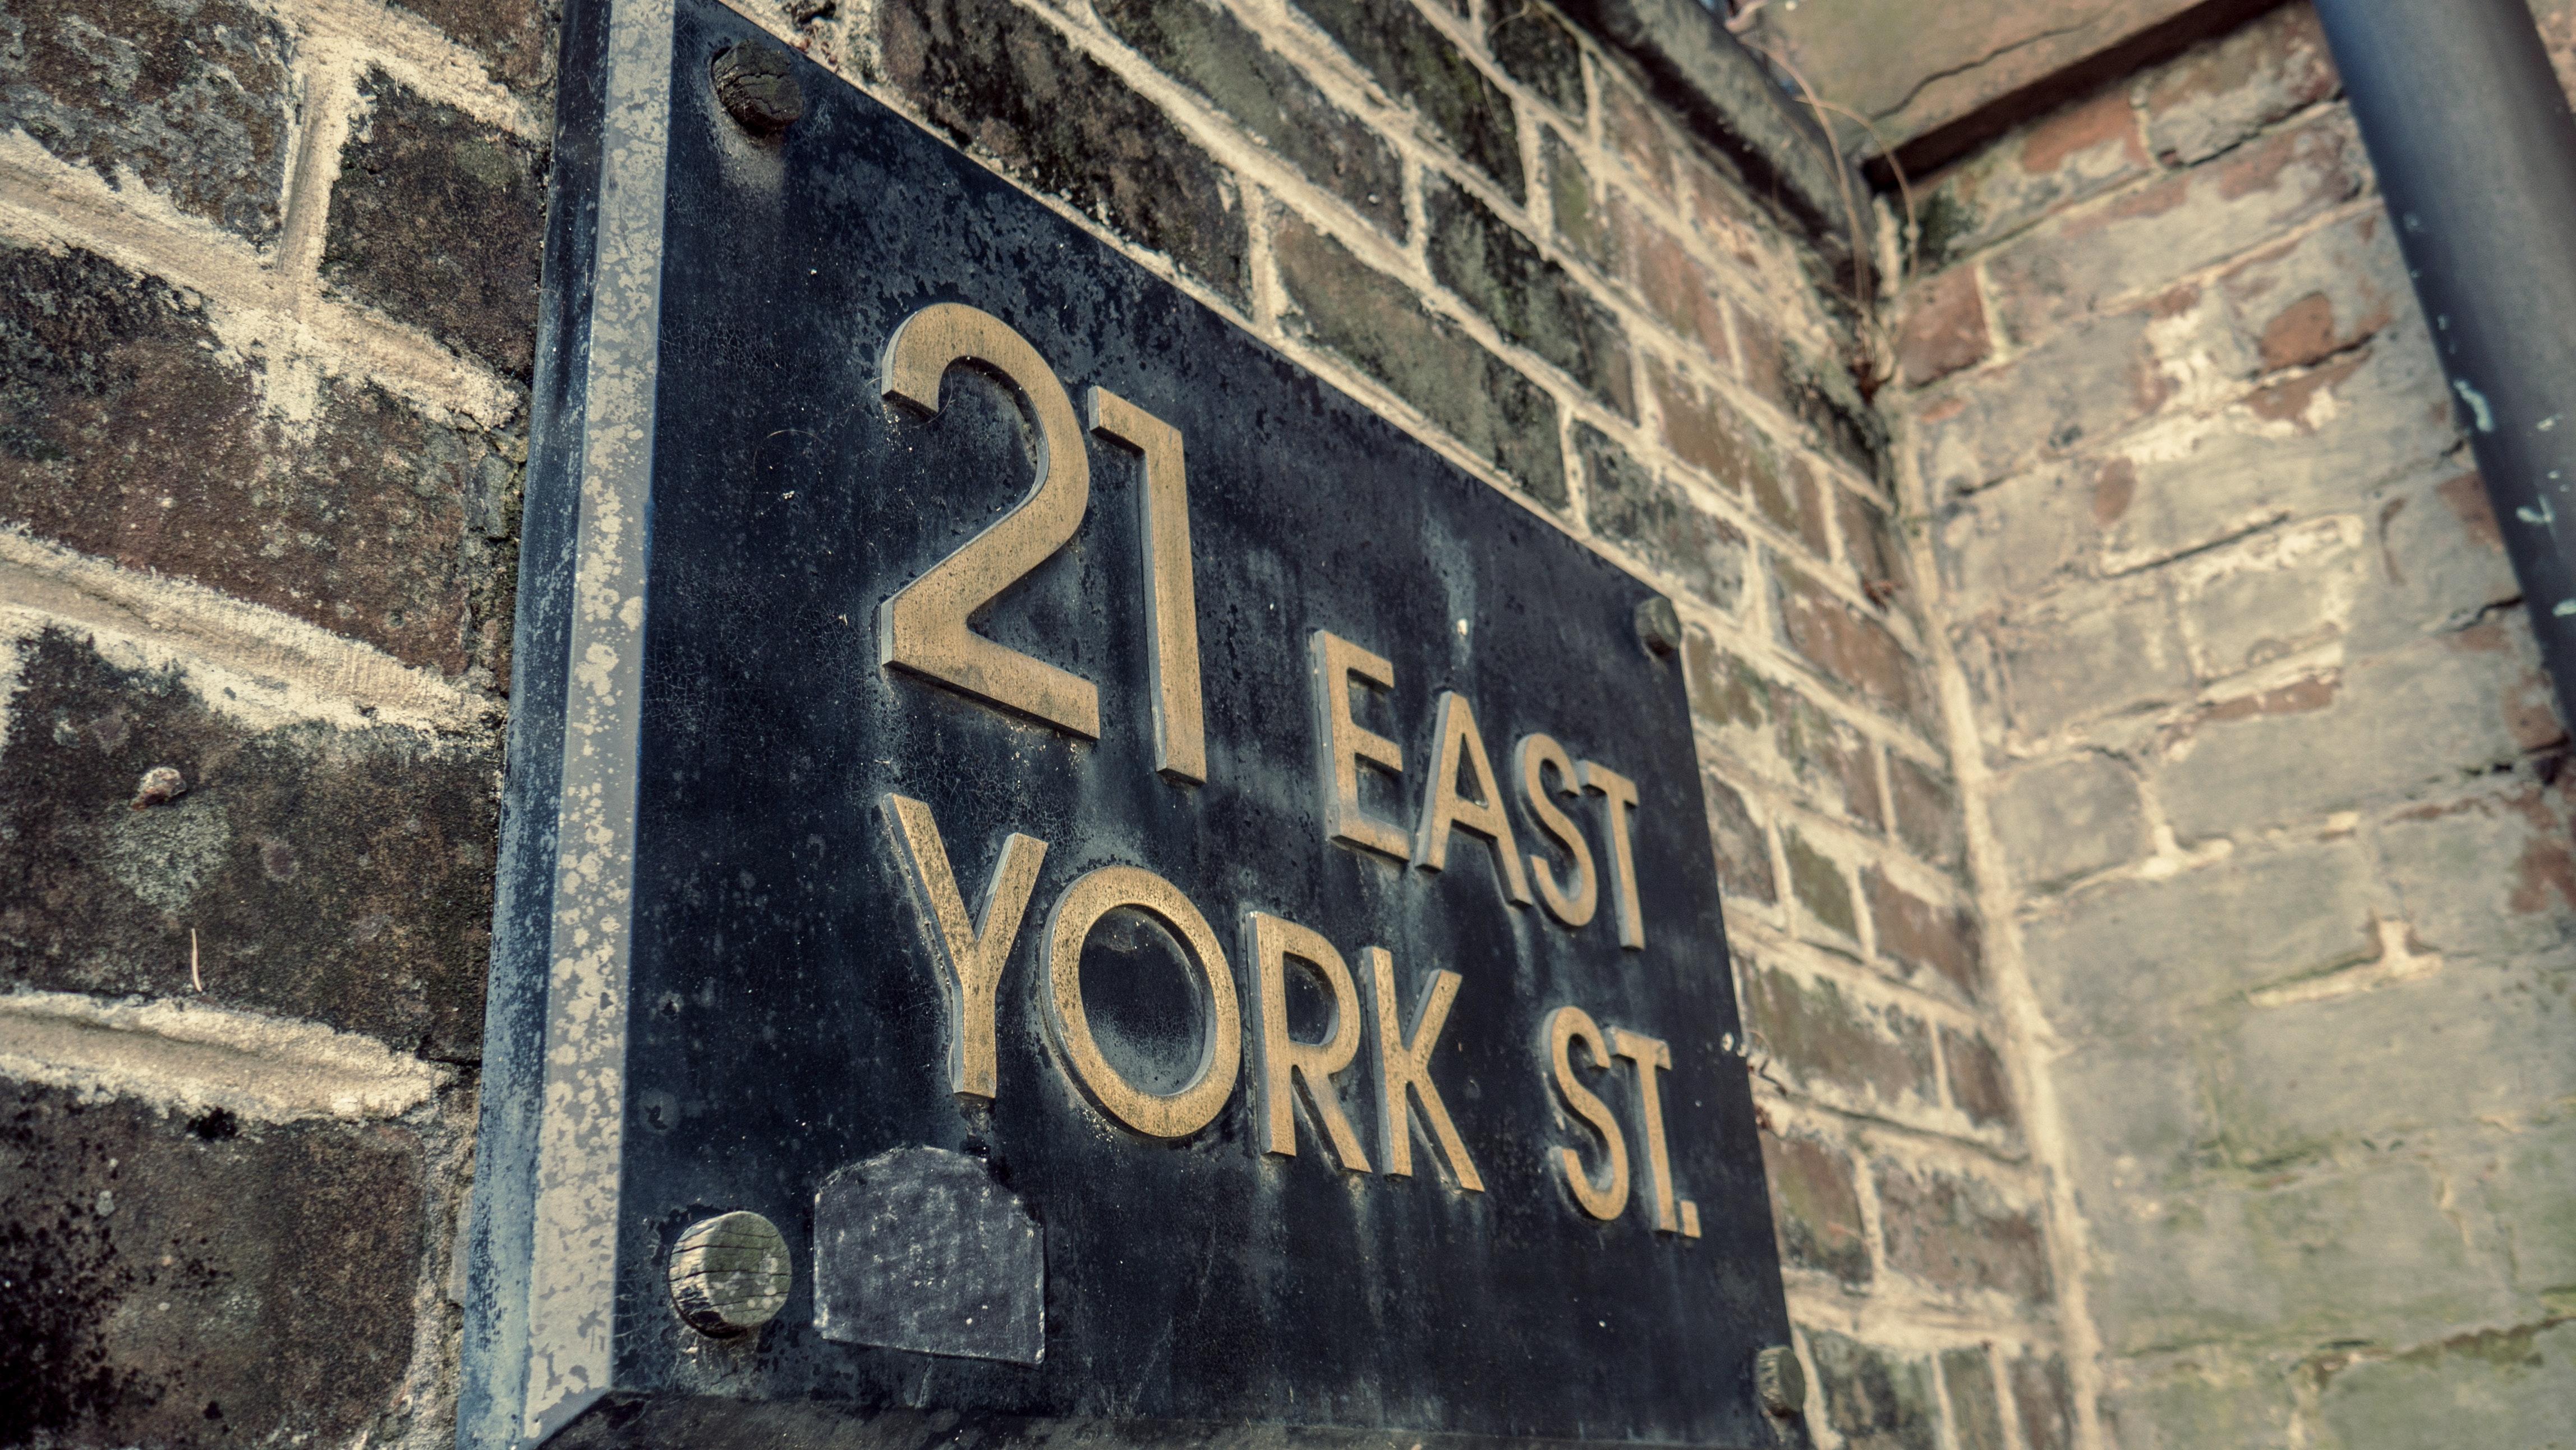 21 east york street photo